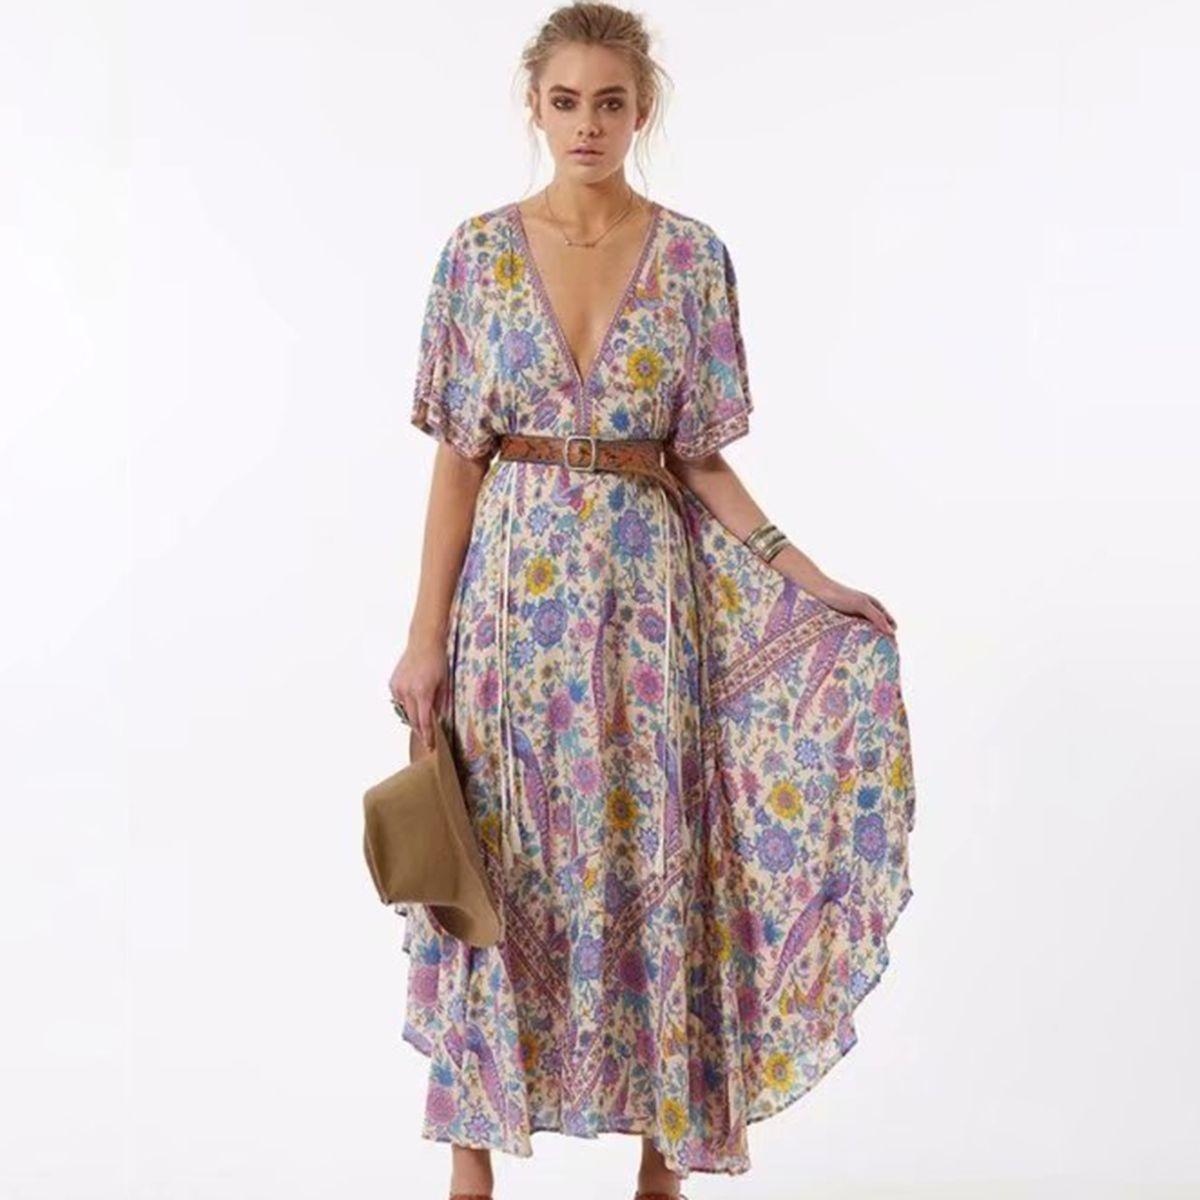 Inséparable Retro Boho Maxi Dress Femmes 2019 Summer Long manches col V Robe Sexy Chic Ladies Big Hem imprimé floral plage Robe longue